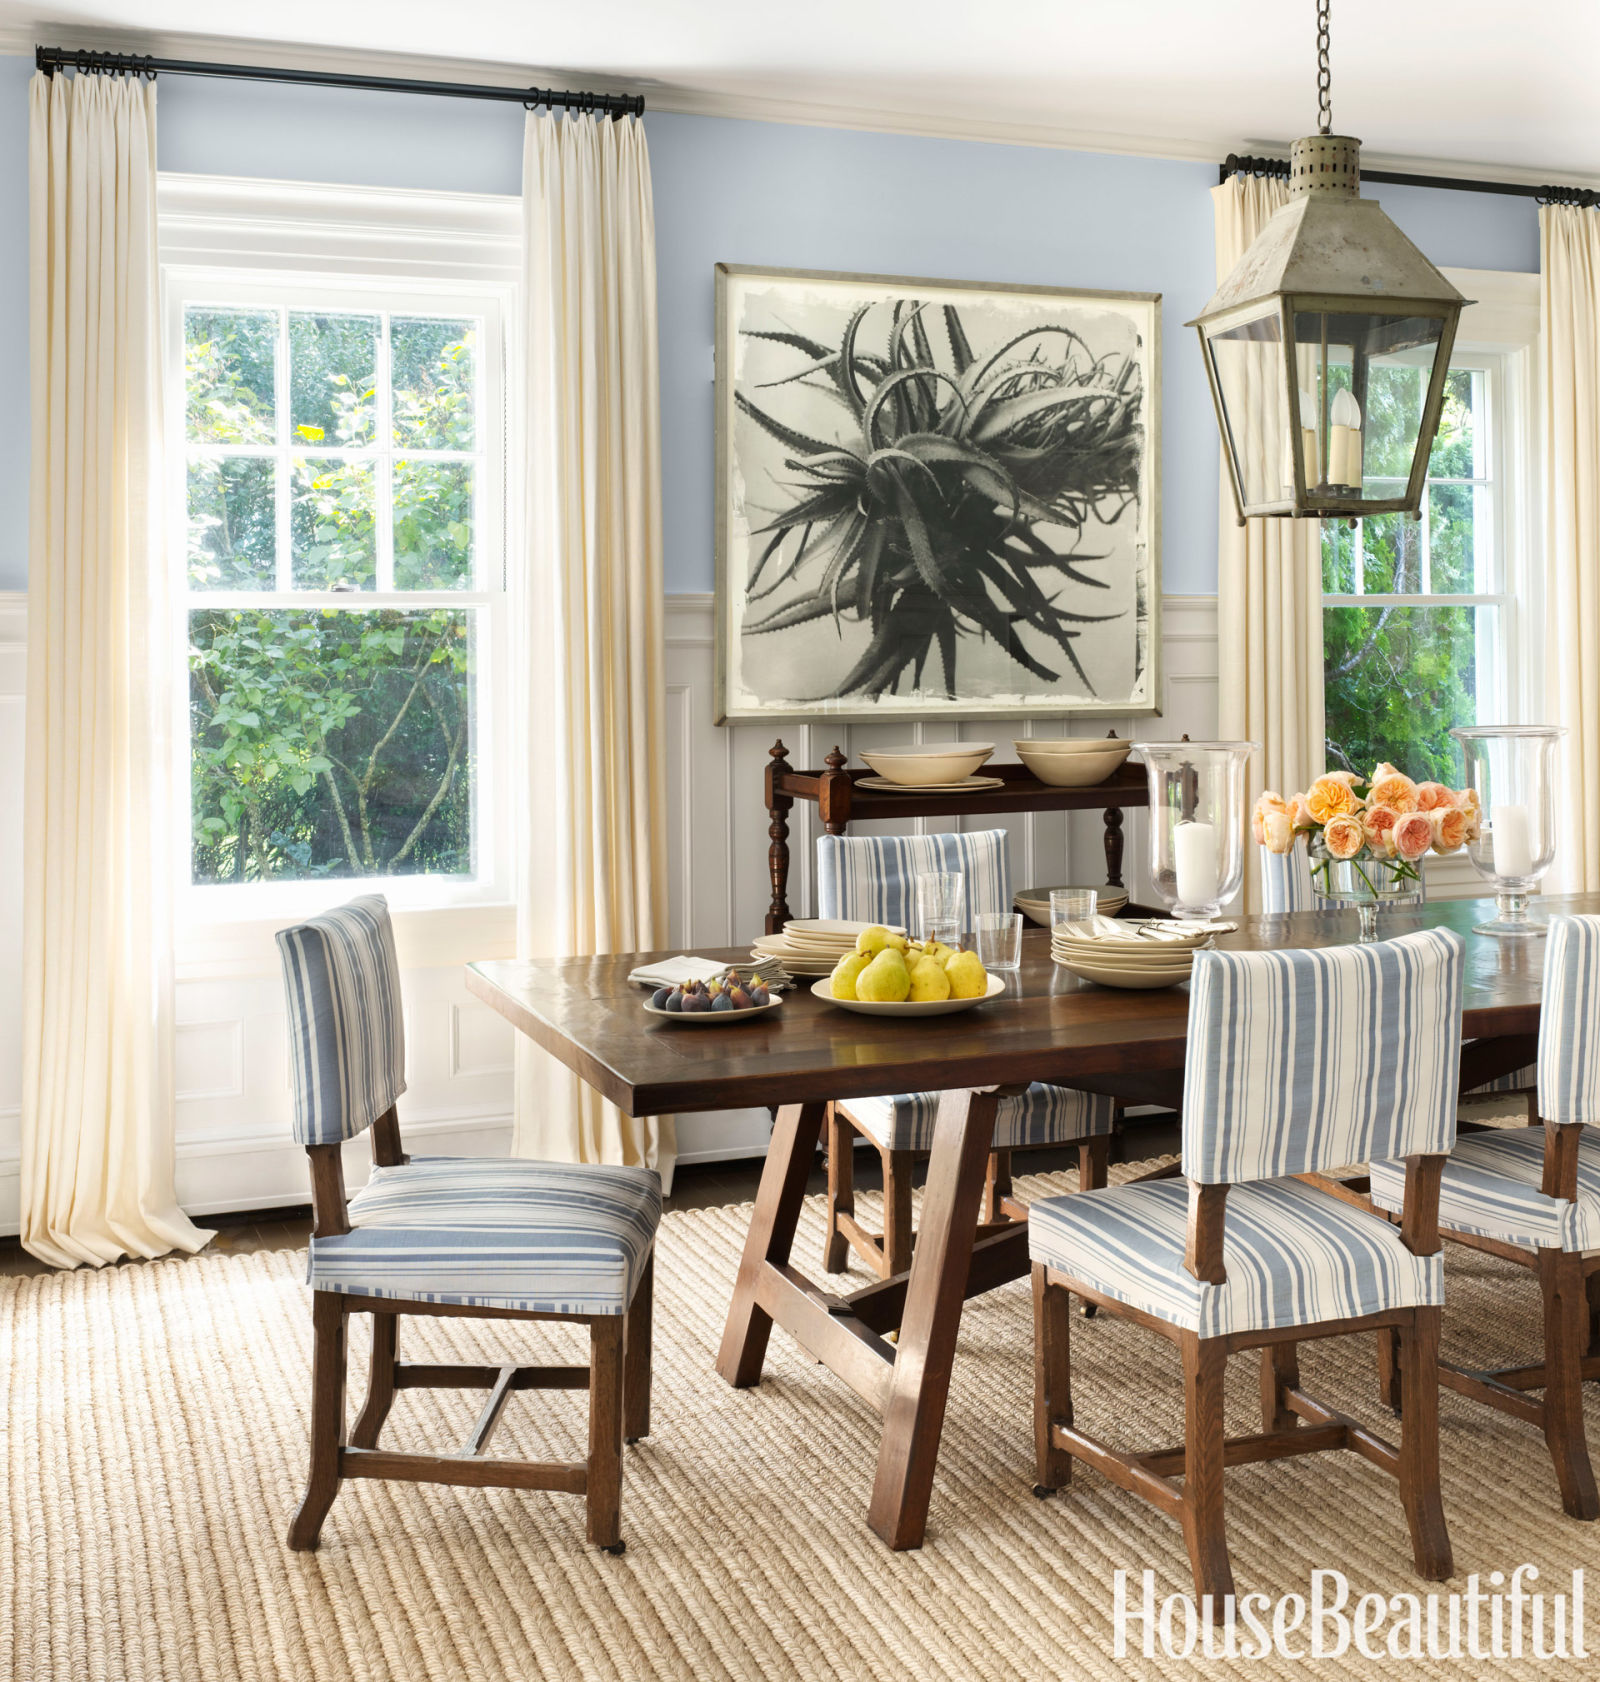 Green Living Room Ideas In East Hampton New York: Robert Stilin Cottage Interior